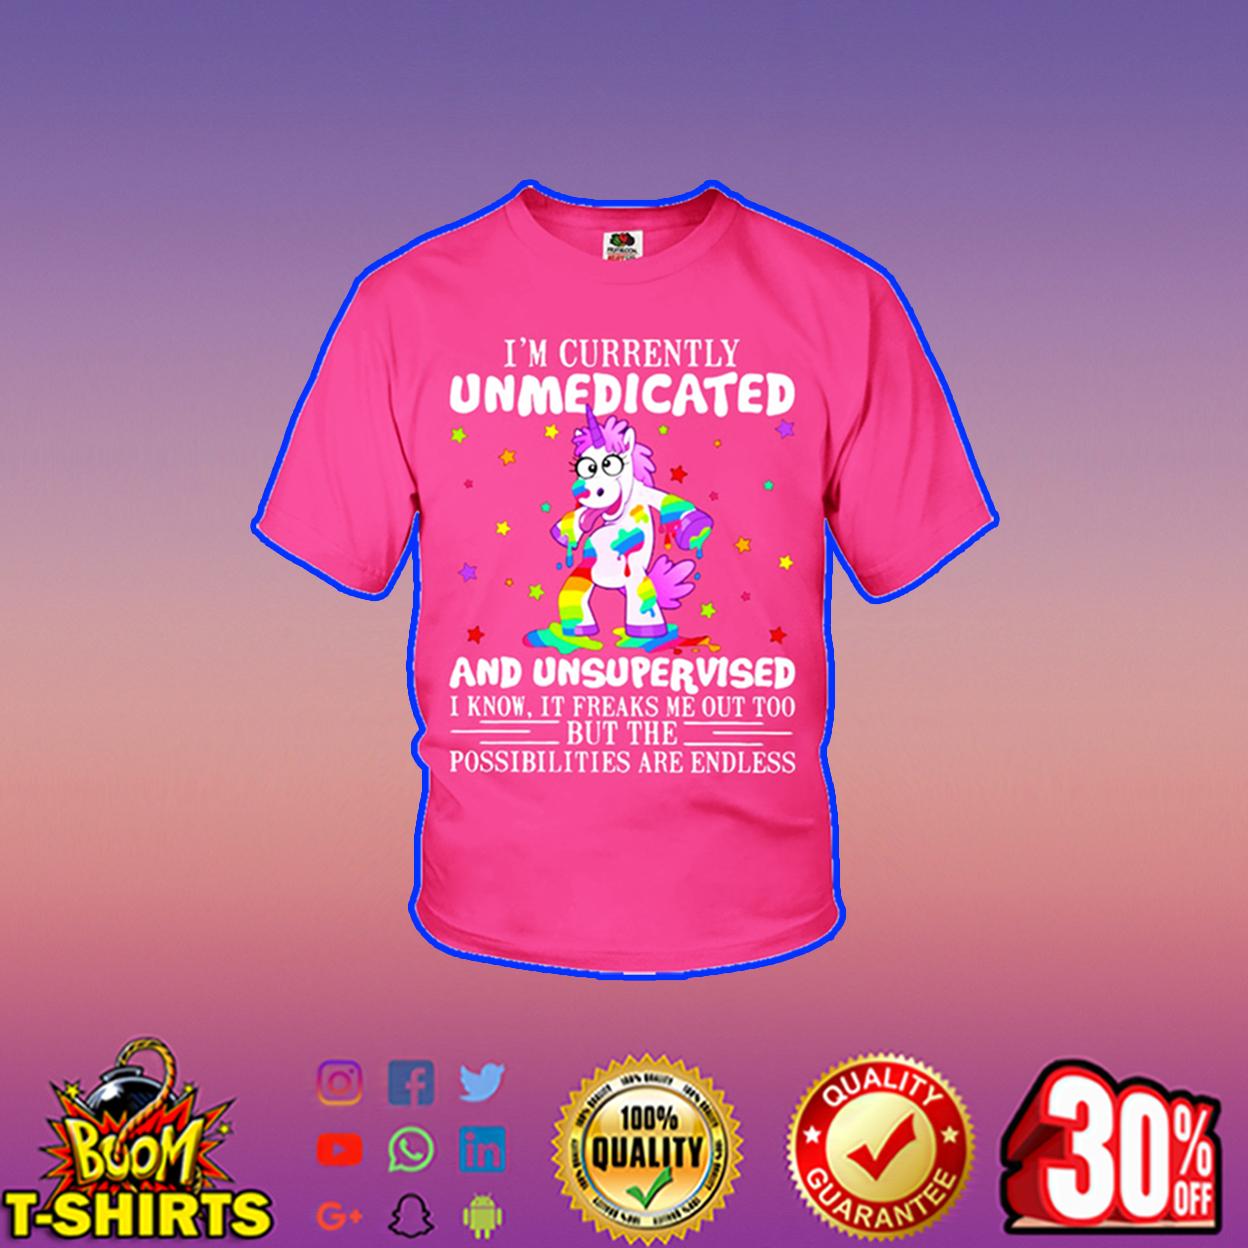 Unicorn I'm currently unmedicated and unsupervised youth t-shirt